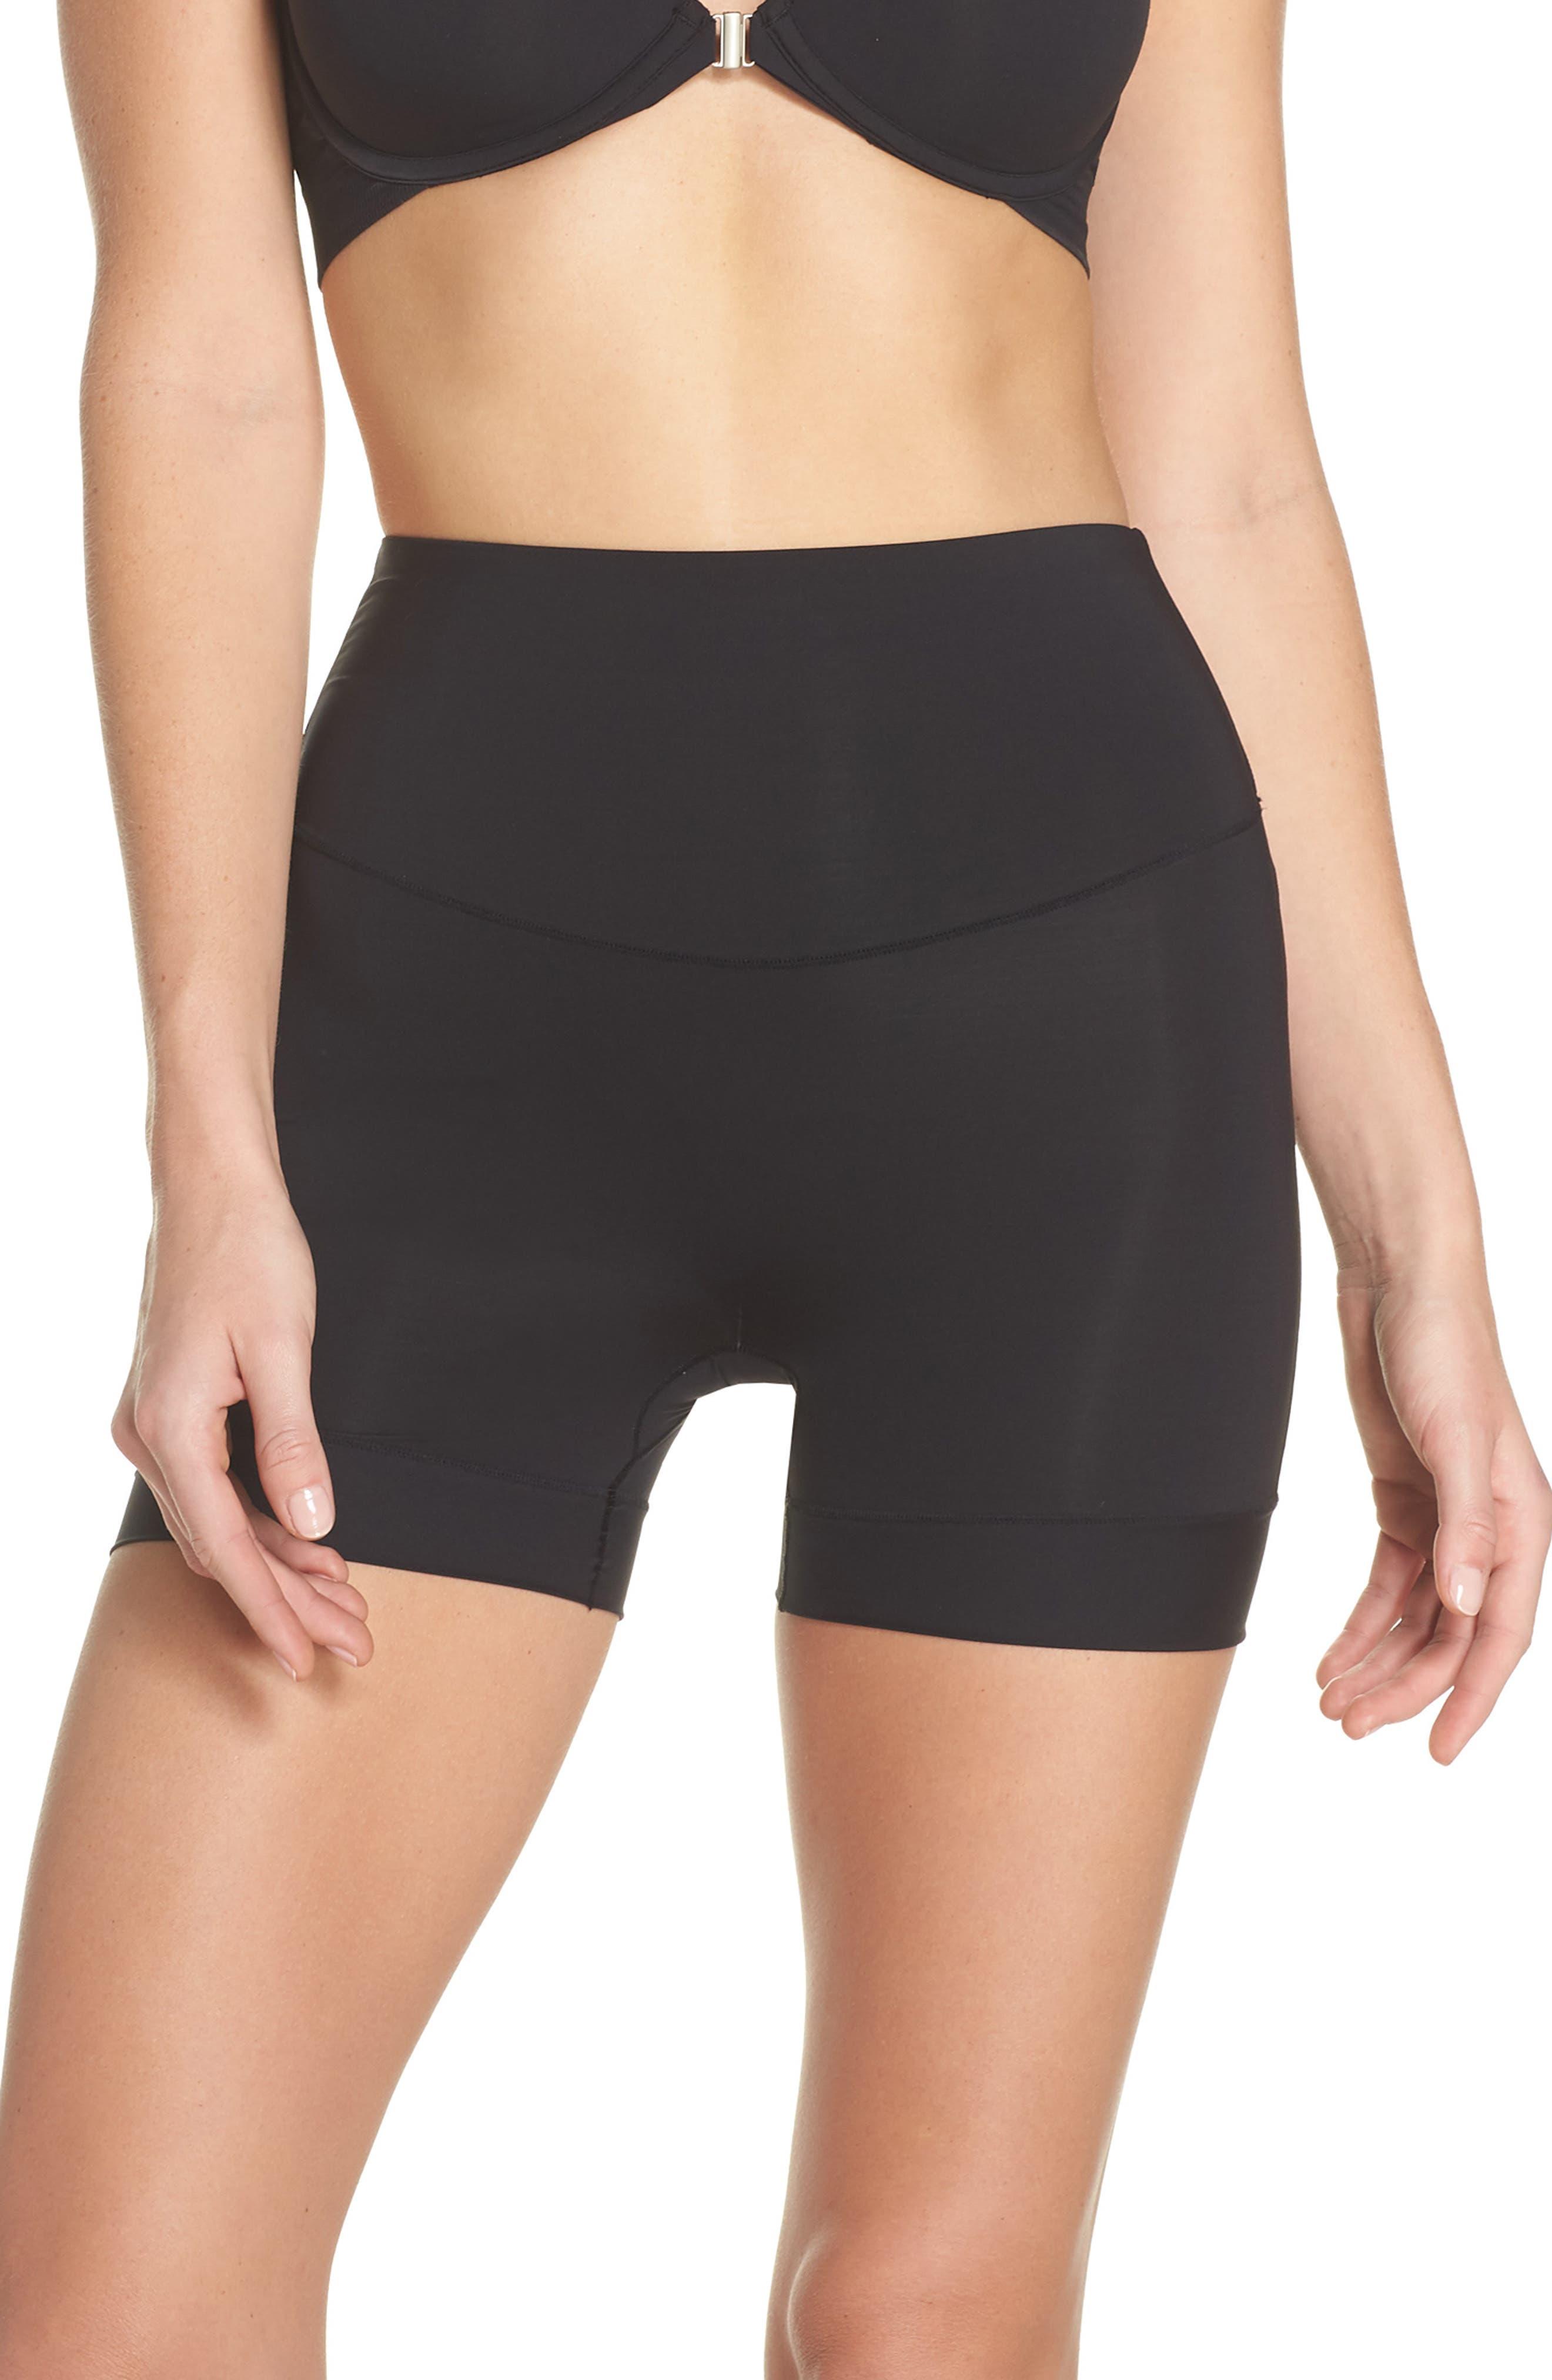 Tummie Tamers Mid Waist Shaping Shorts,                         Main,                         color, 001